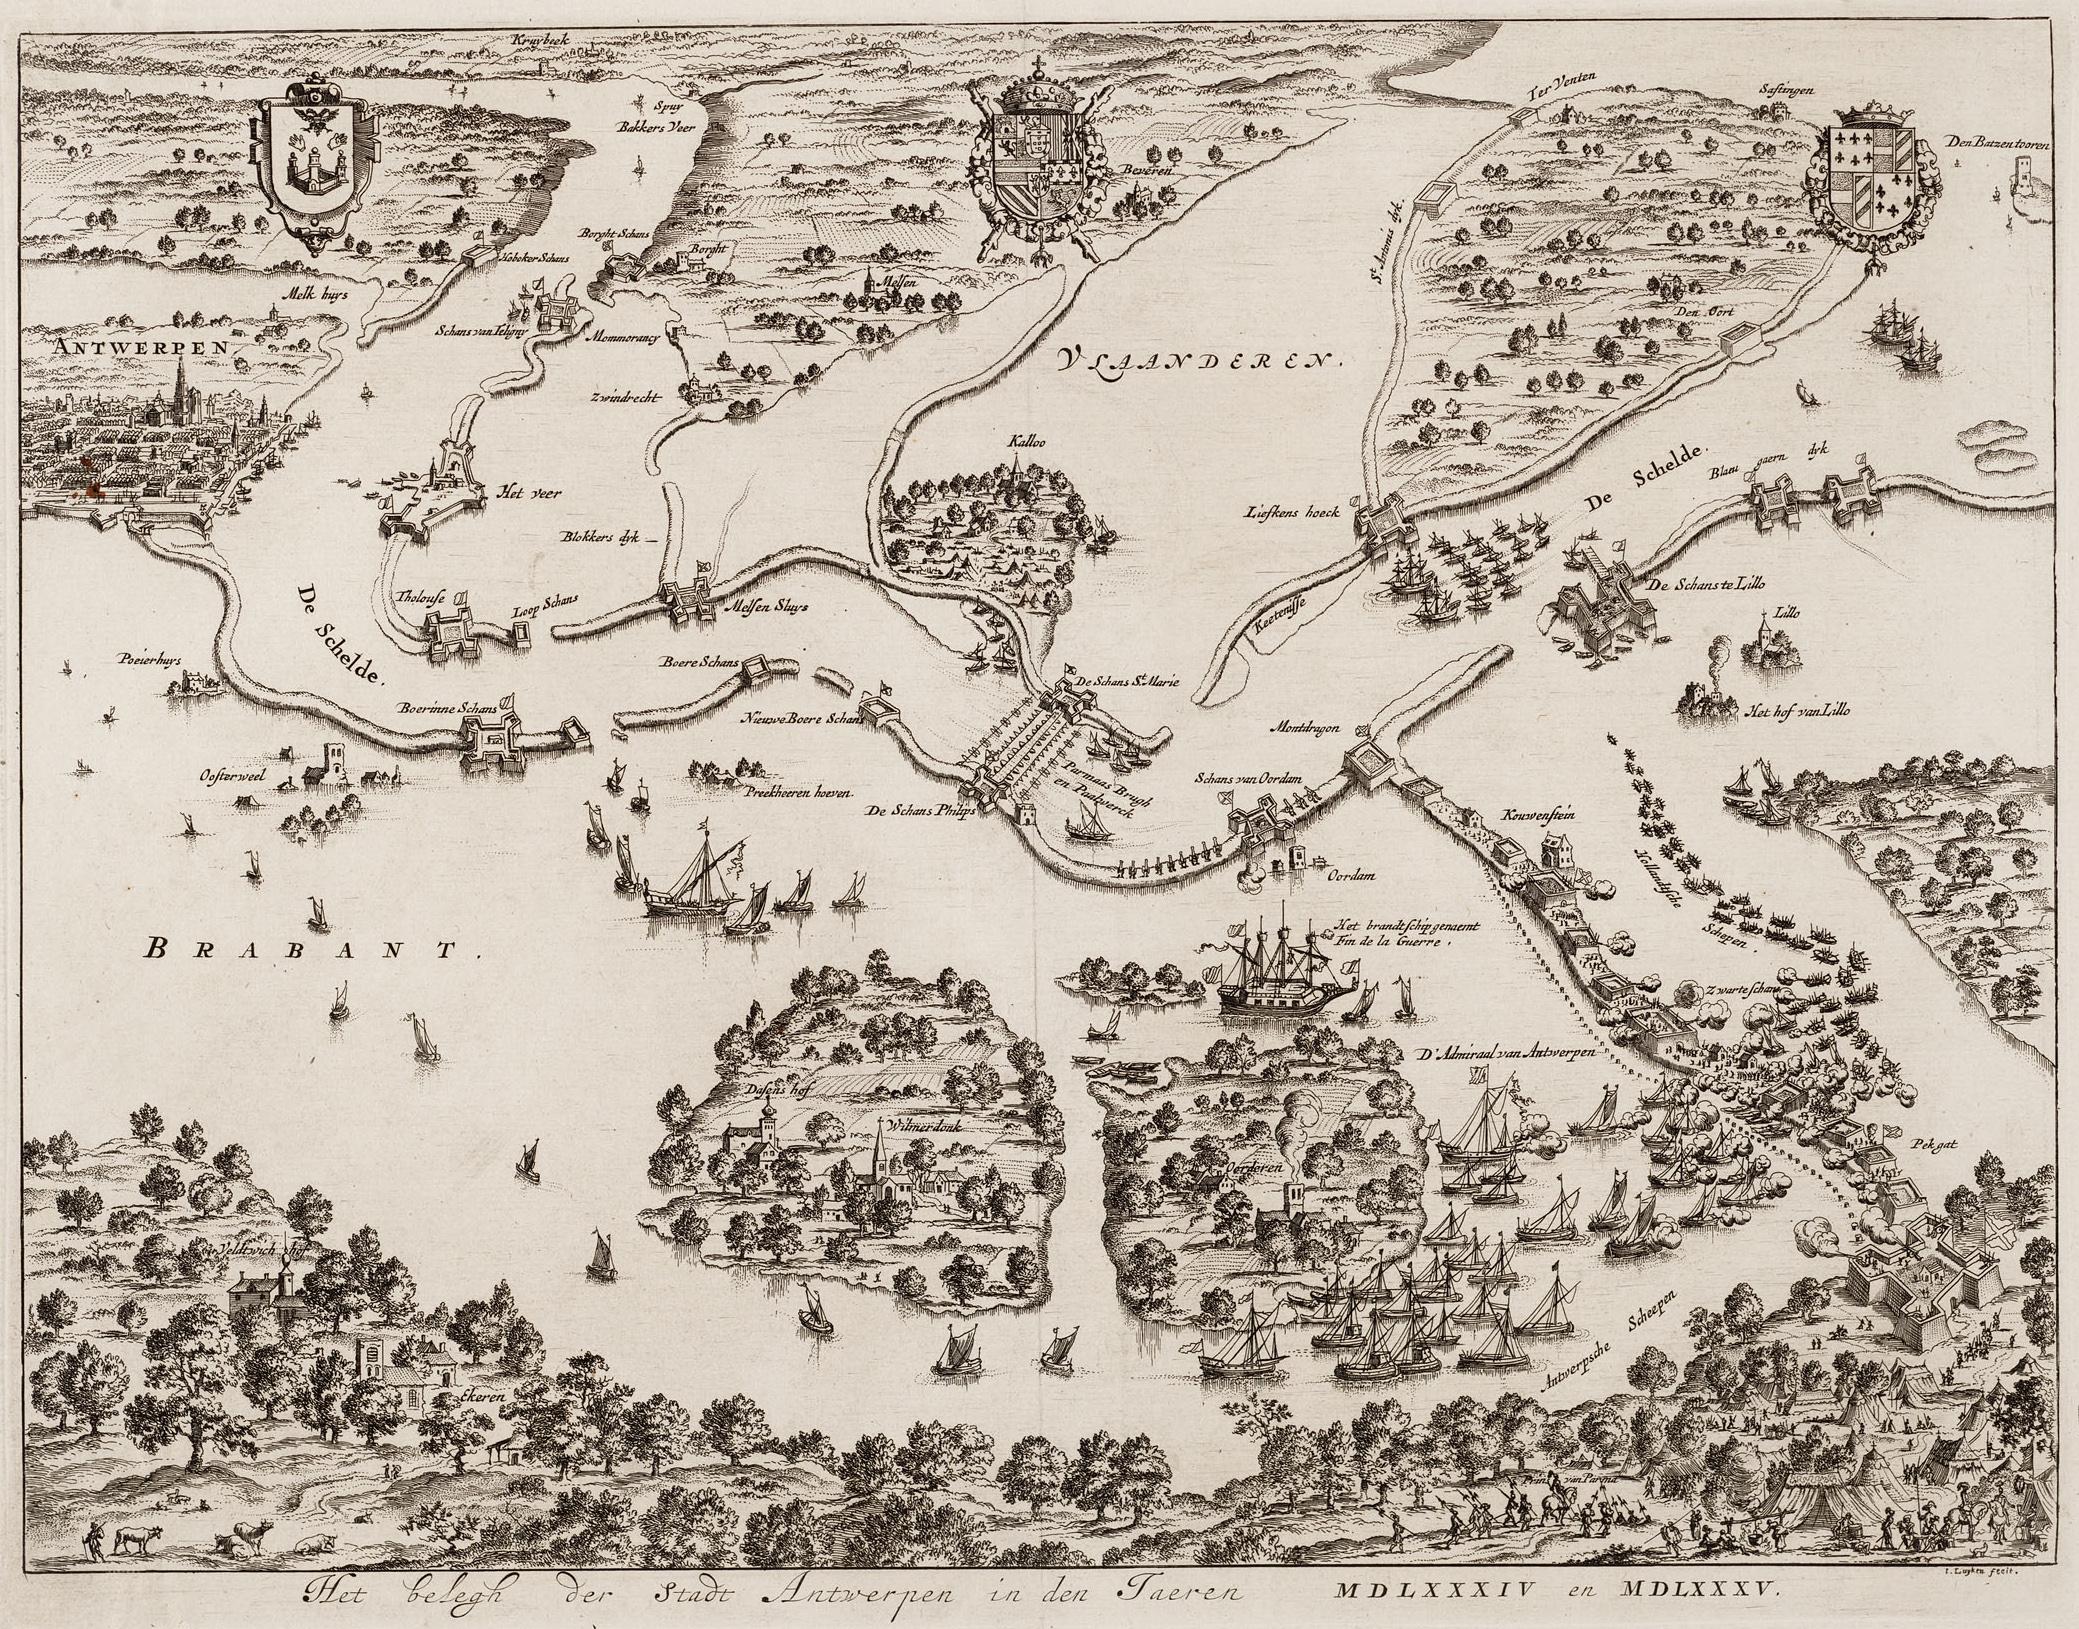 Siege_of_Antwerp_1584-1585_-_Het_belegh_